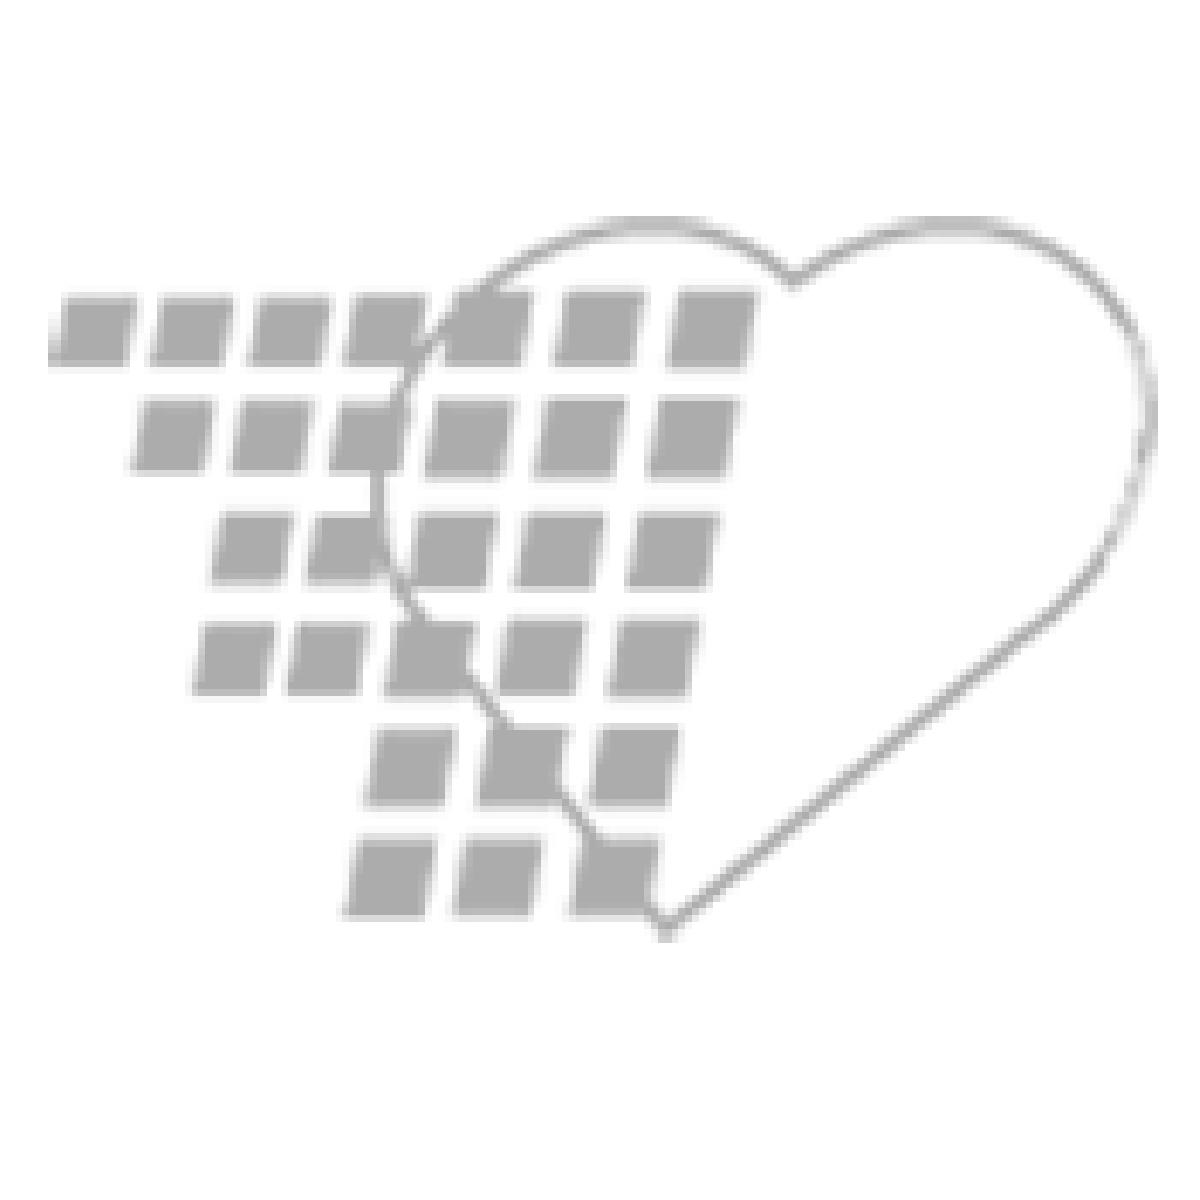 10-81-8624 - Demo Dose® Inject-Ed Pad